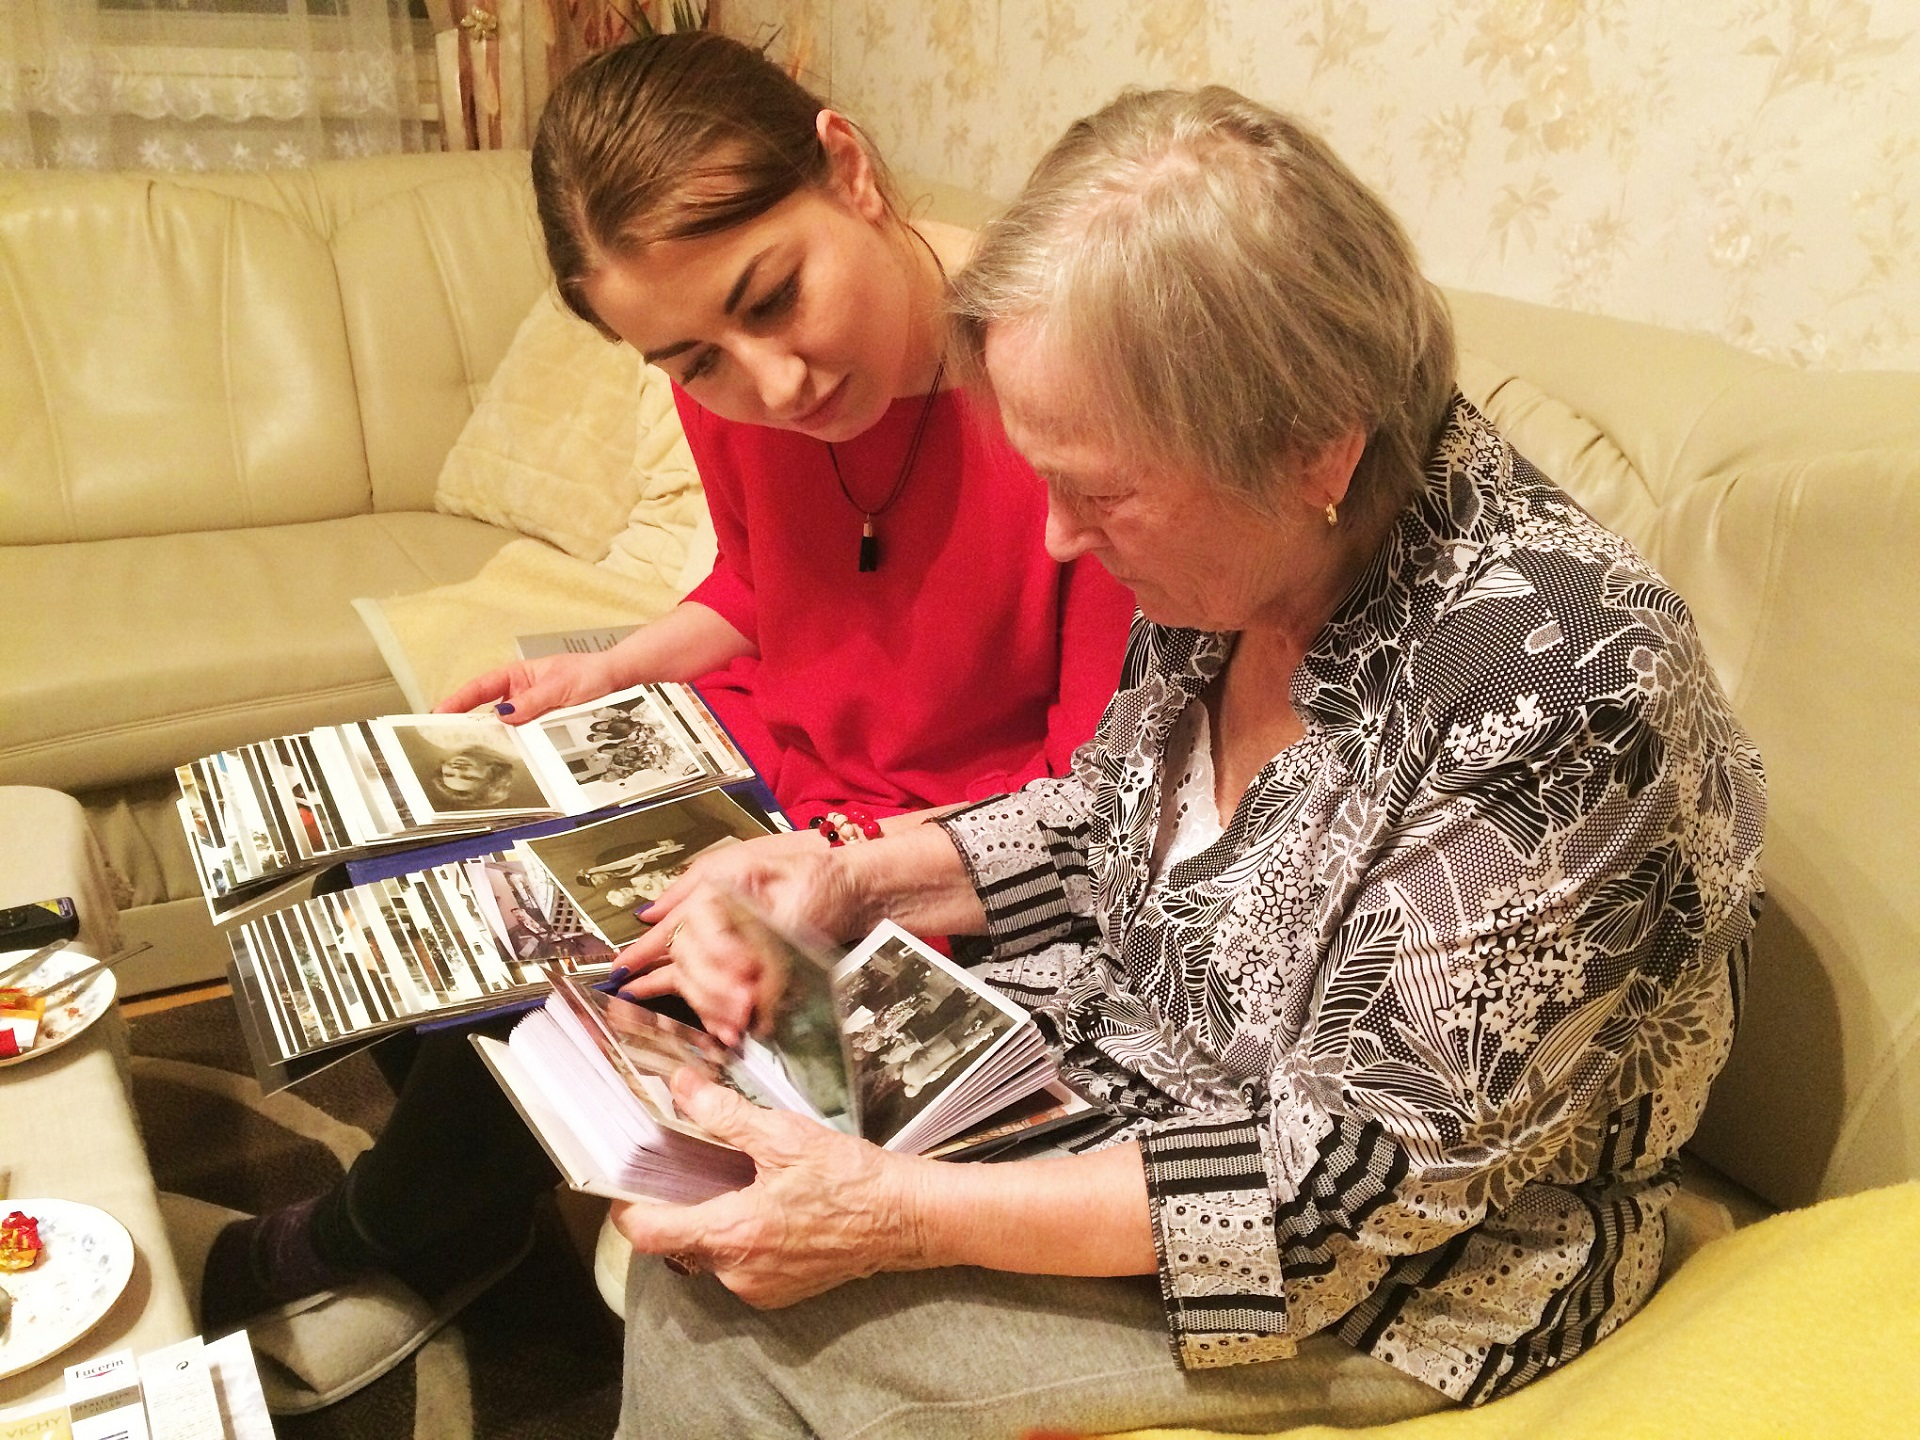 Interviu akimirka Berlyne su vilko vaiku Dora Gudienė